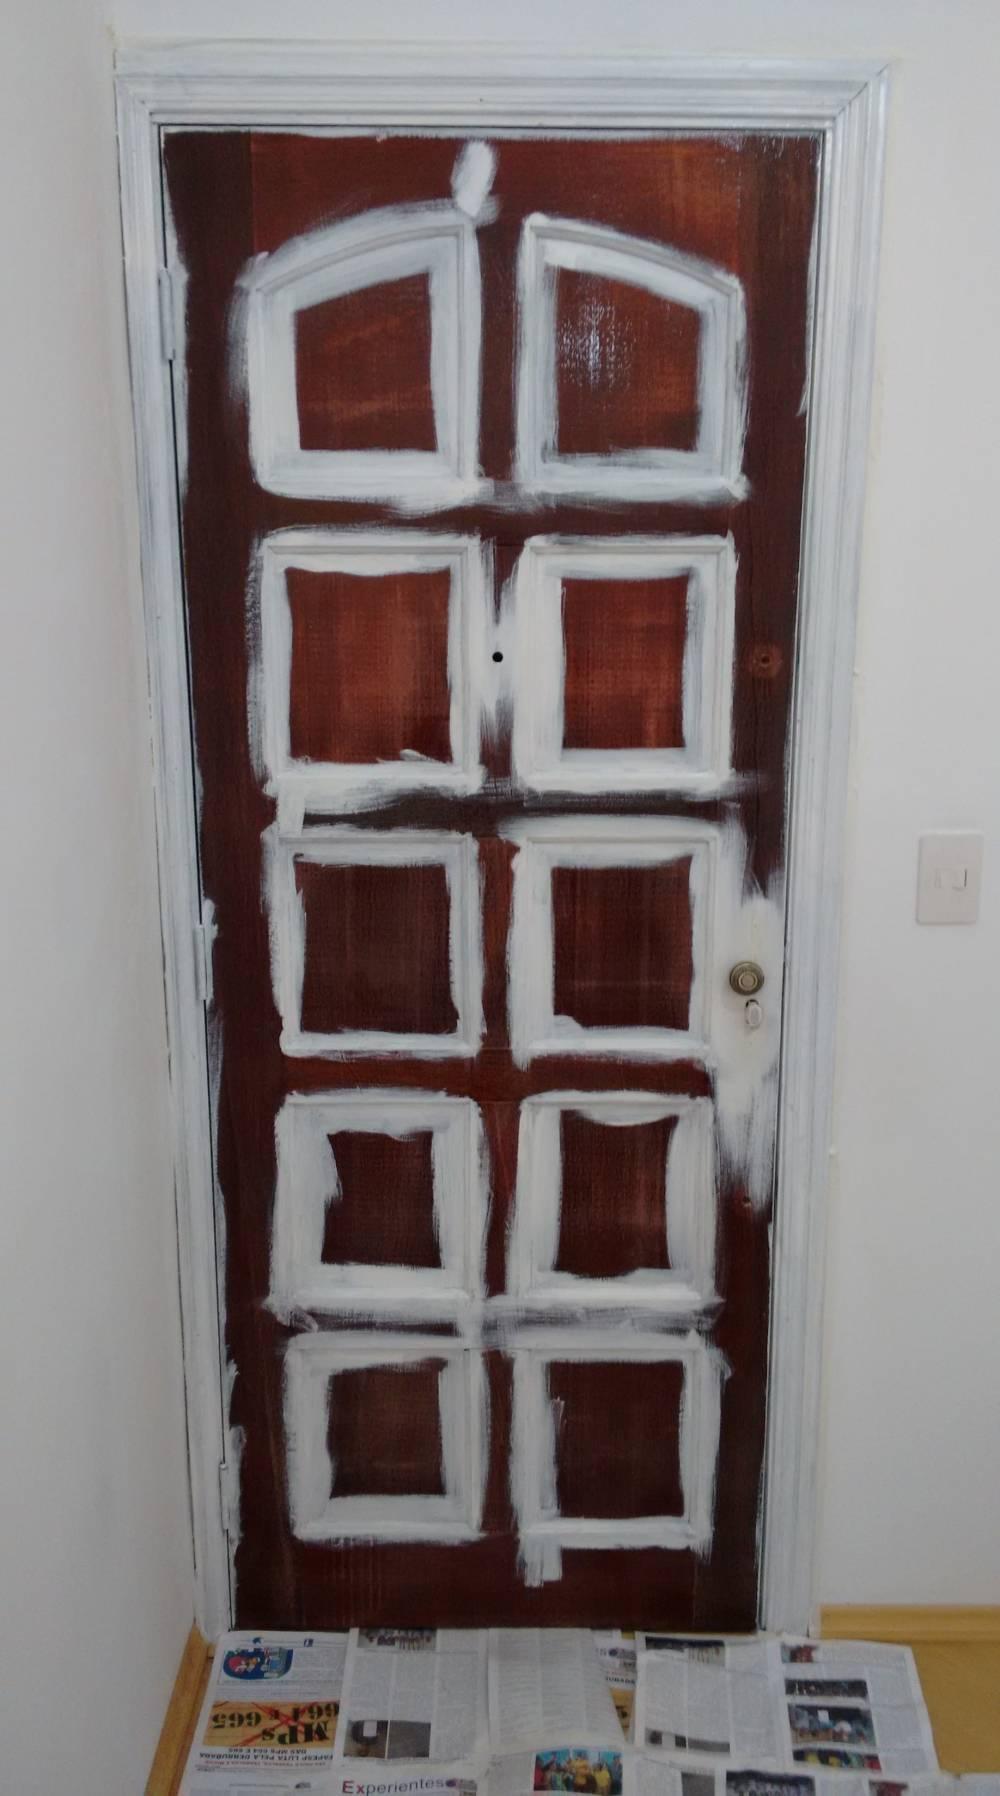 Reparos Residenciais na Vila Formosa - Reparos Residenciais